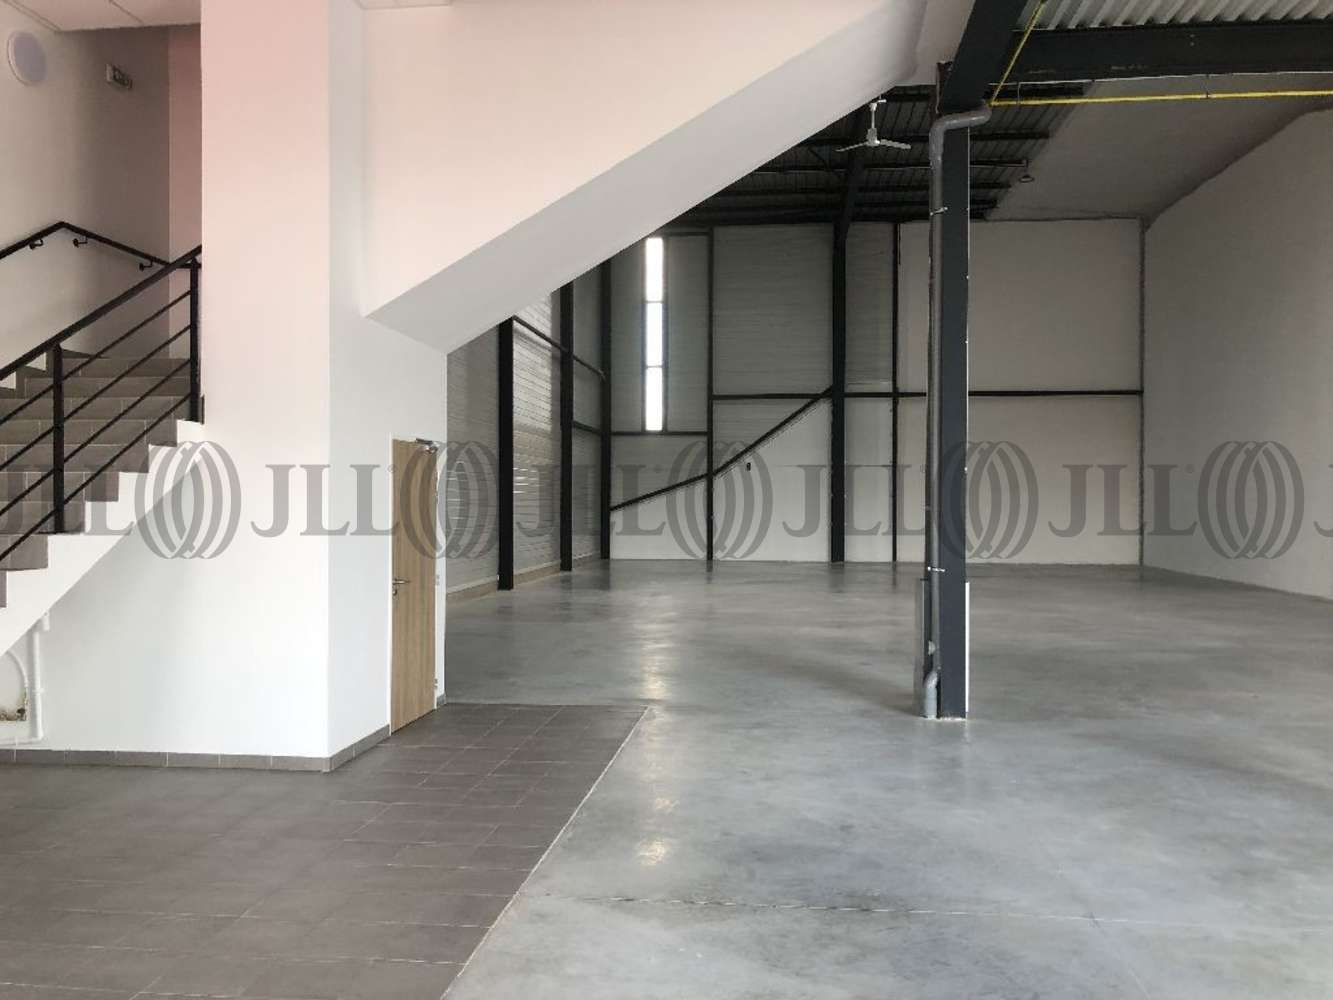 Activités/entrepôt Groslay, 95410 - MONTS DU VAL D'OISE